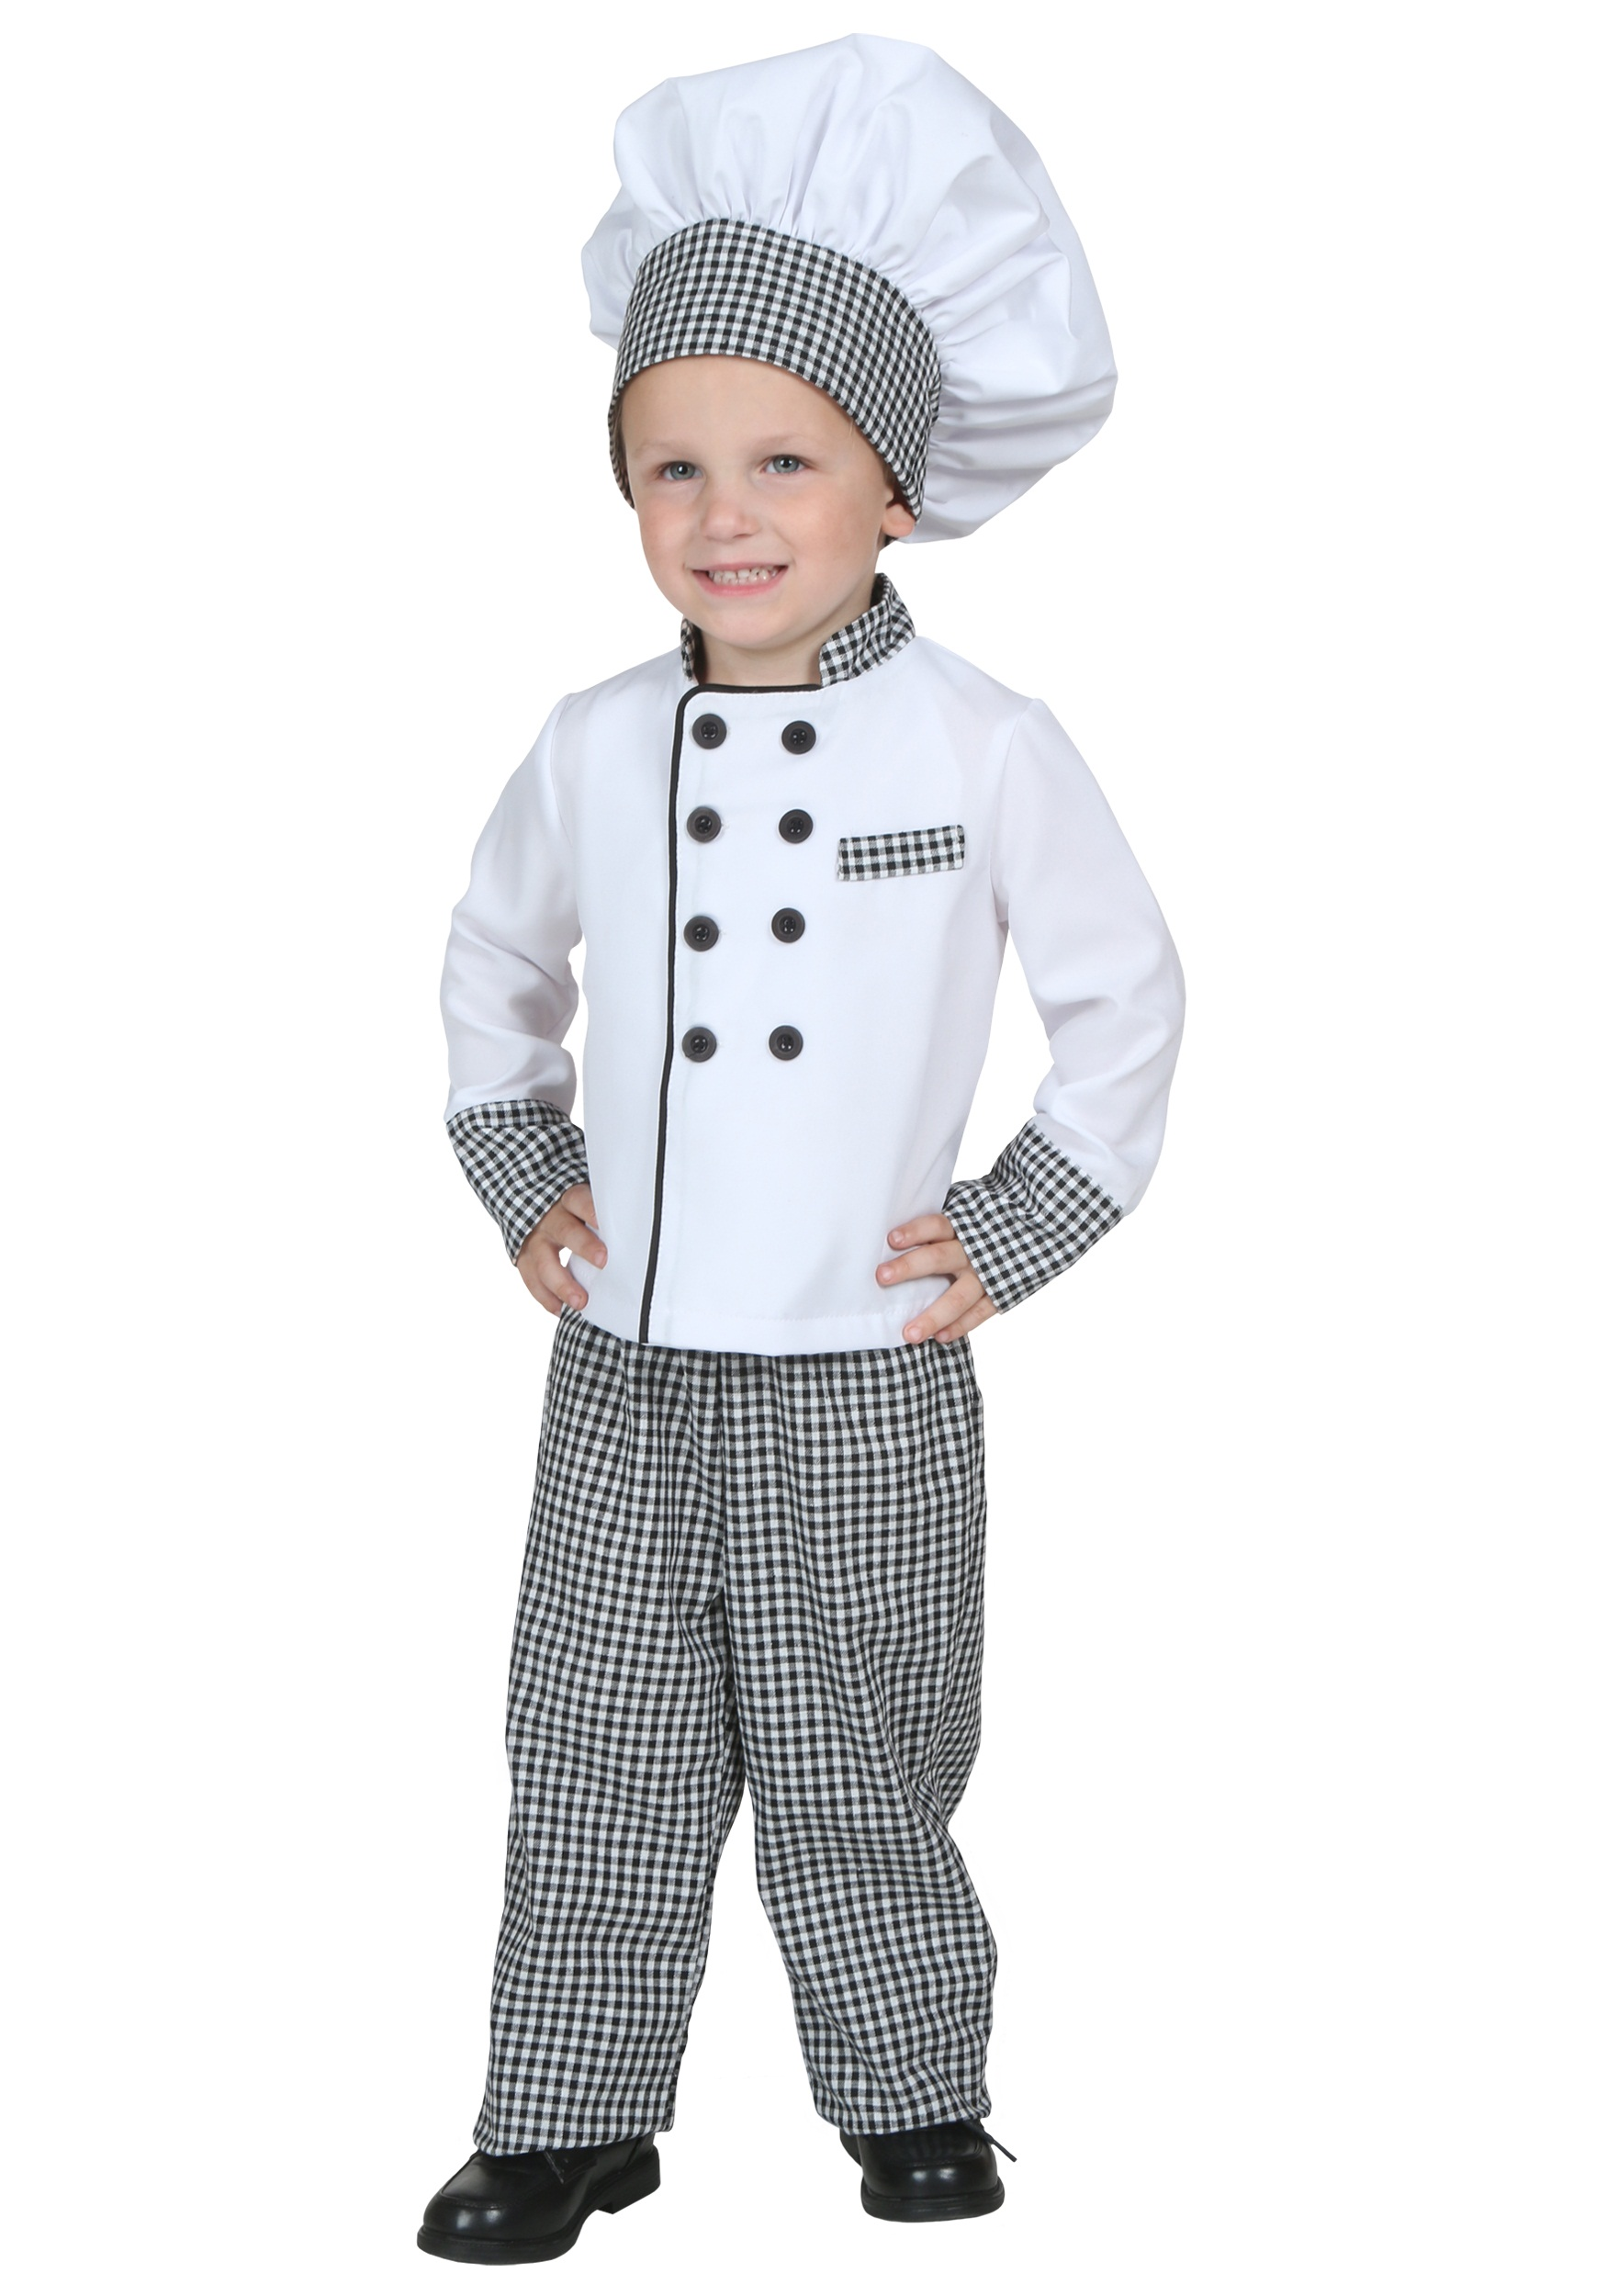 Toddler Chef Costume | Uniform Costume | Exclusive